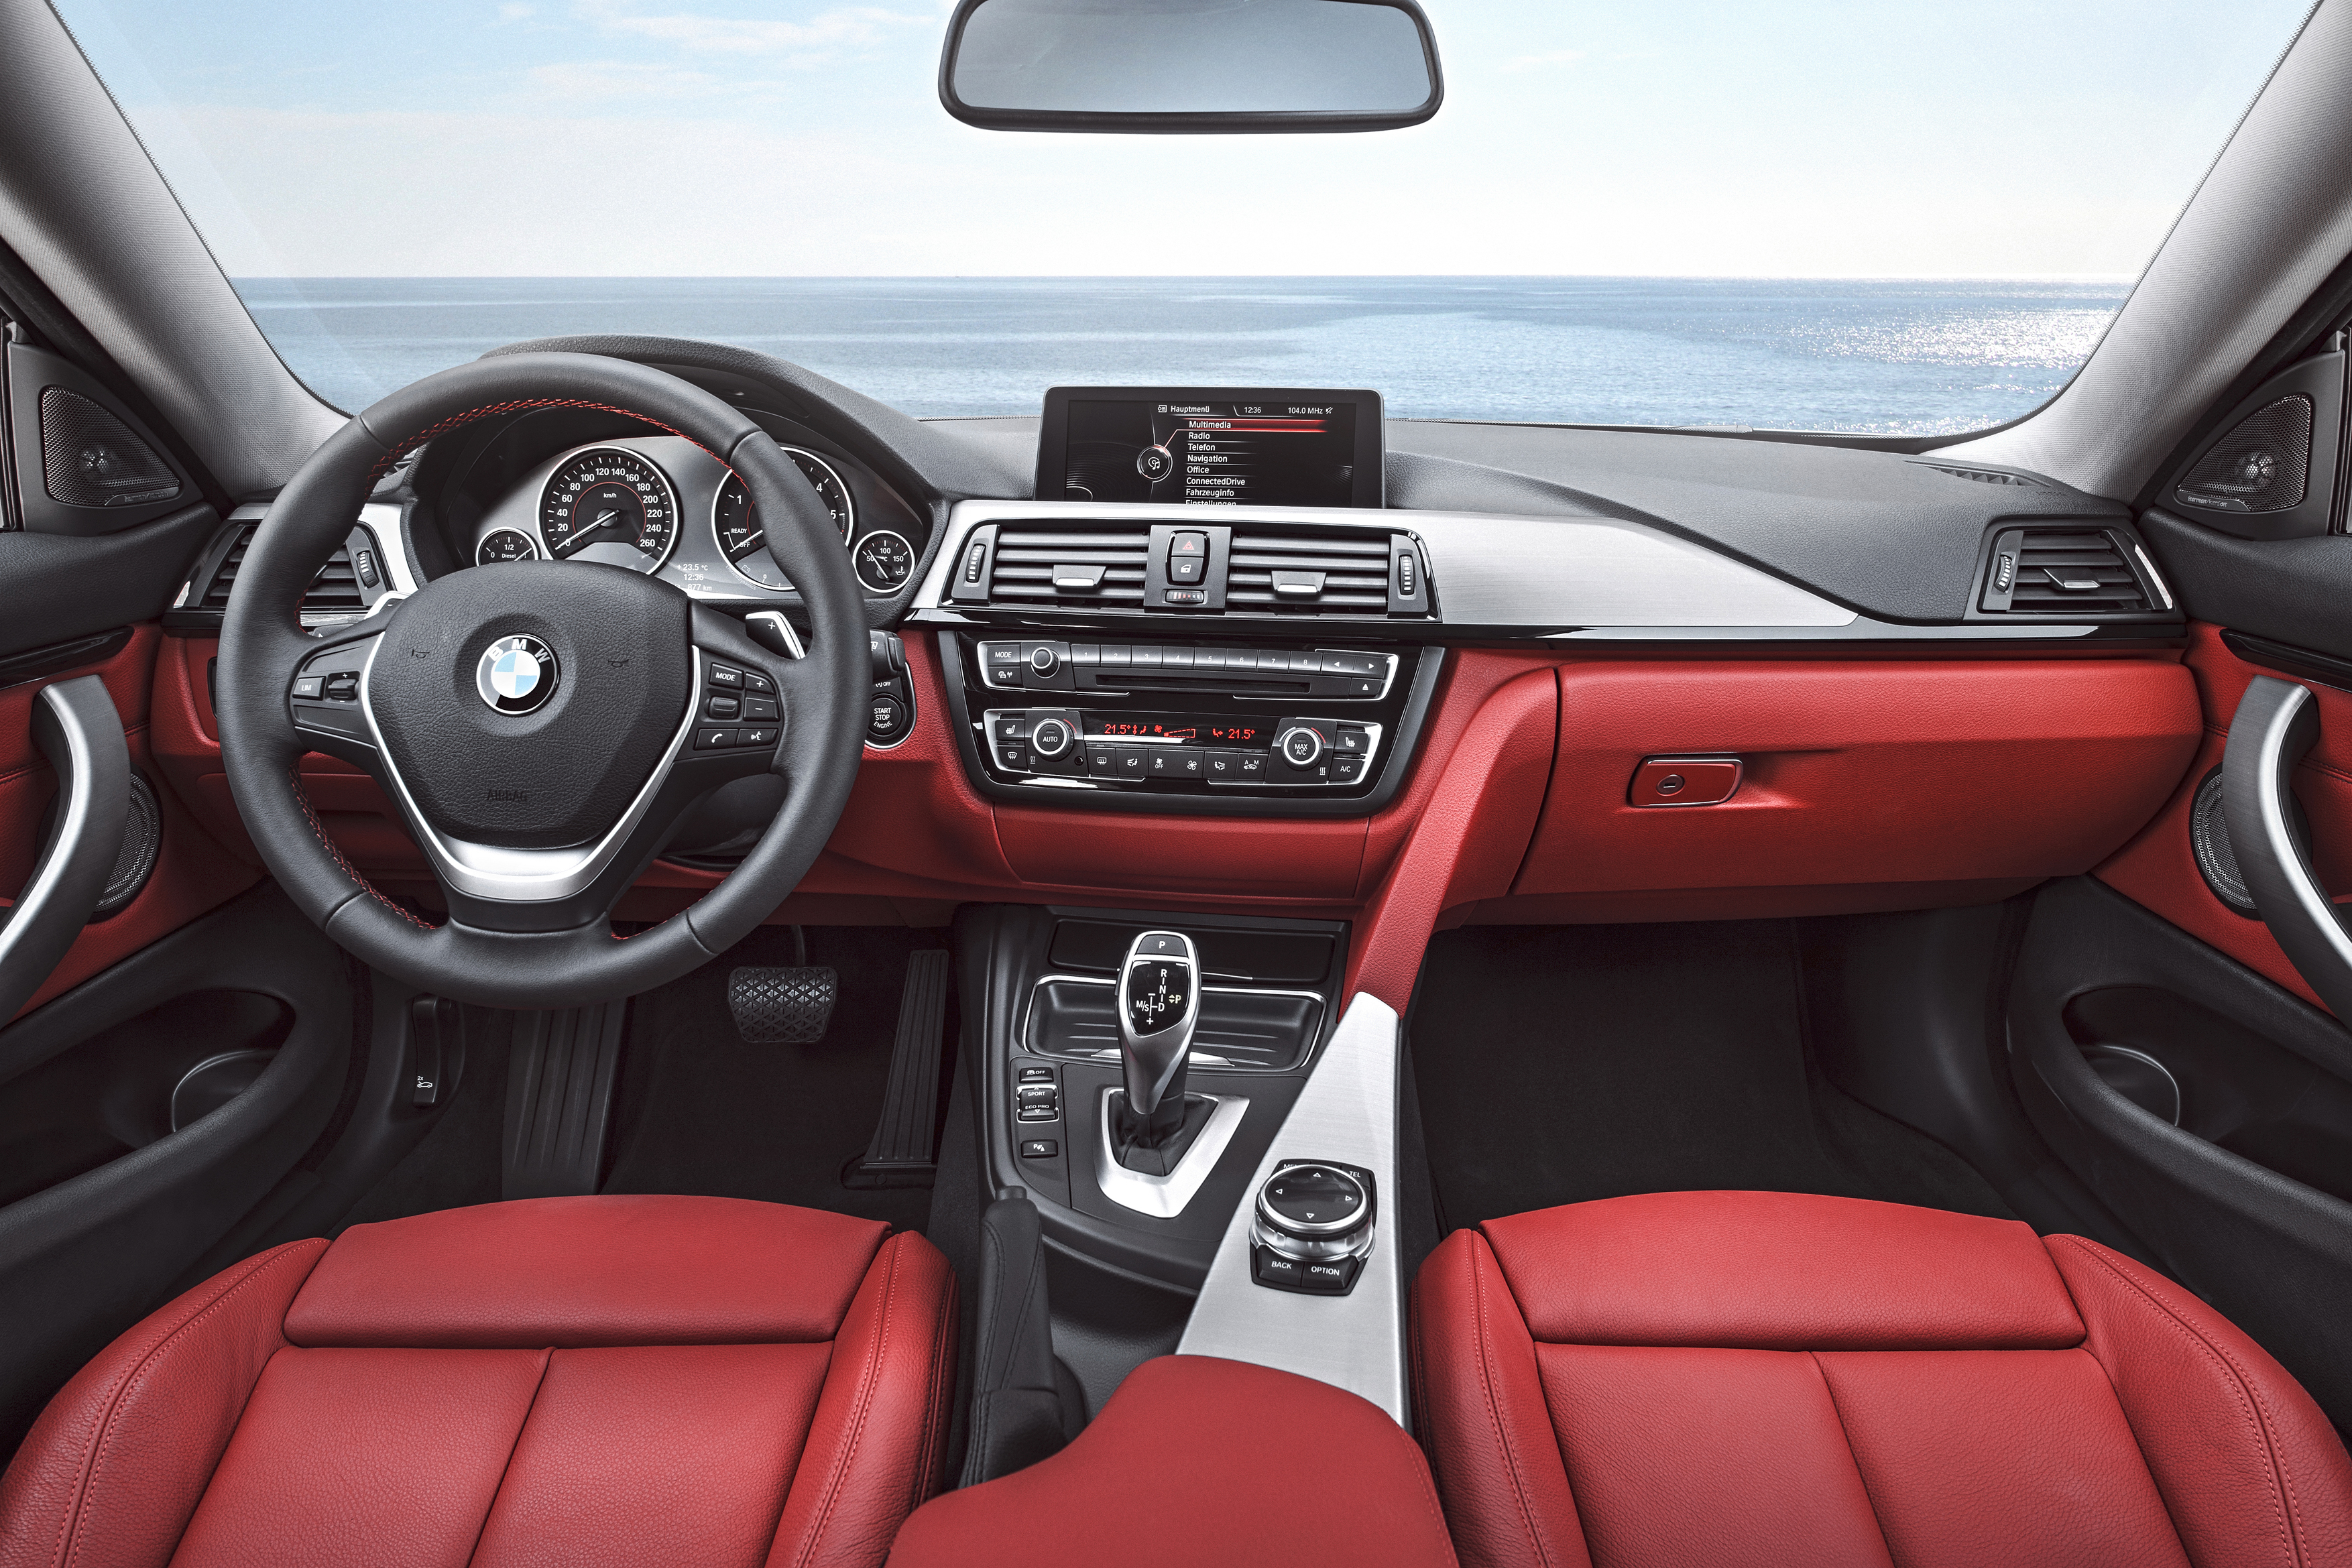 Bmw 435i zhp coupe 2016 pictures information amp specs - Wheels Bmw 435i Da Man Magazine